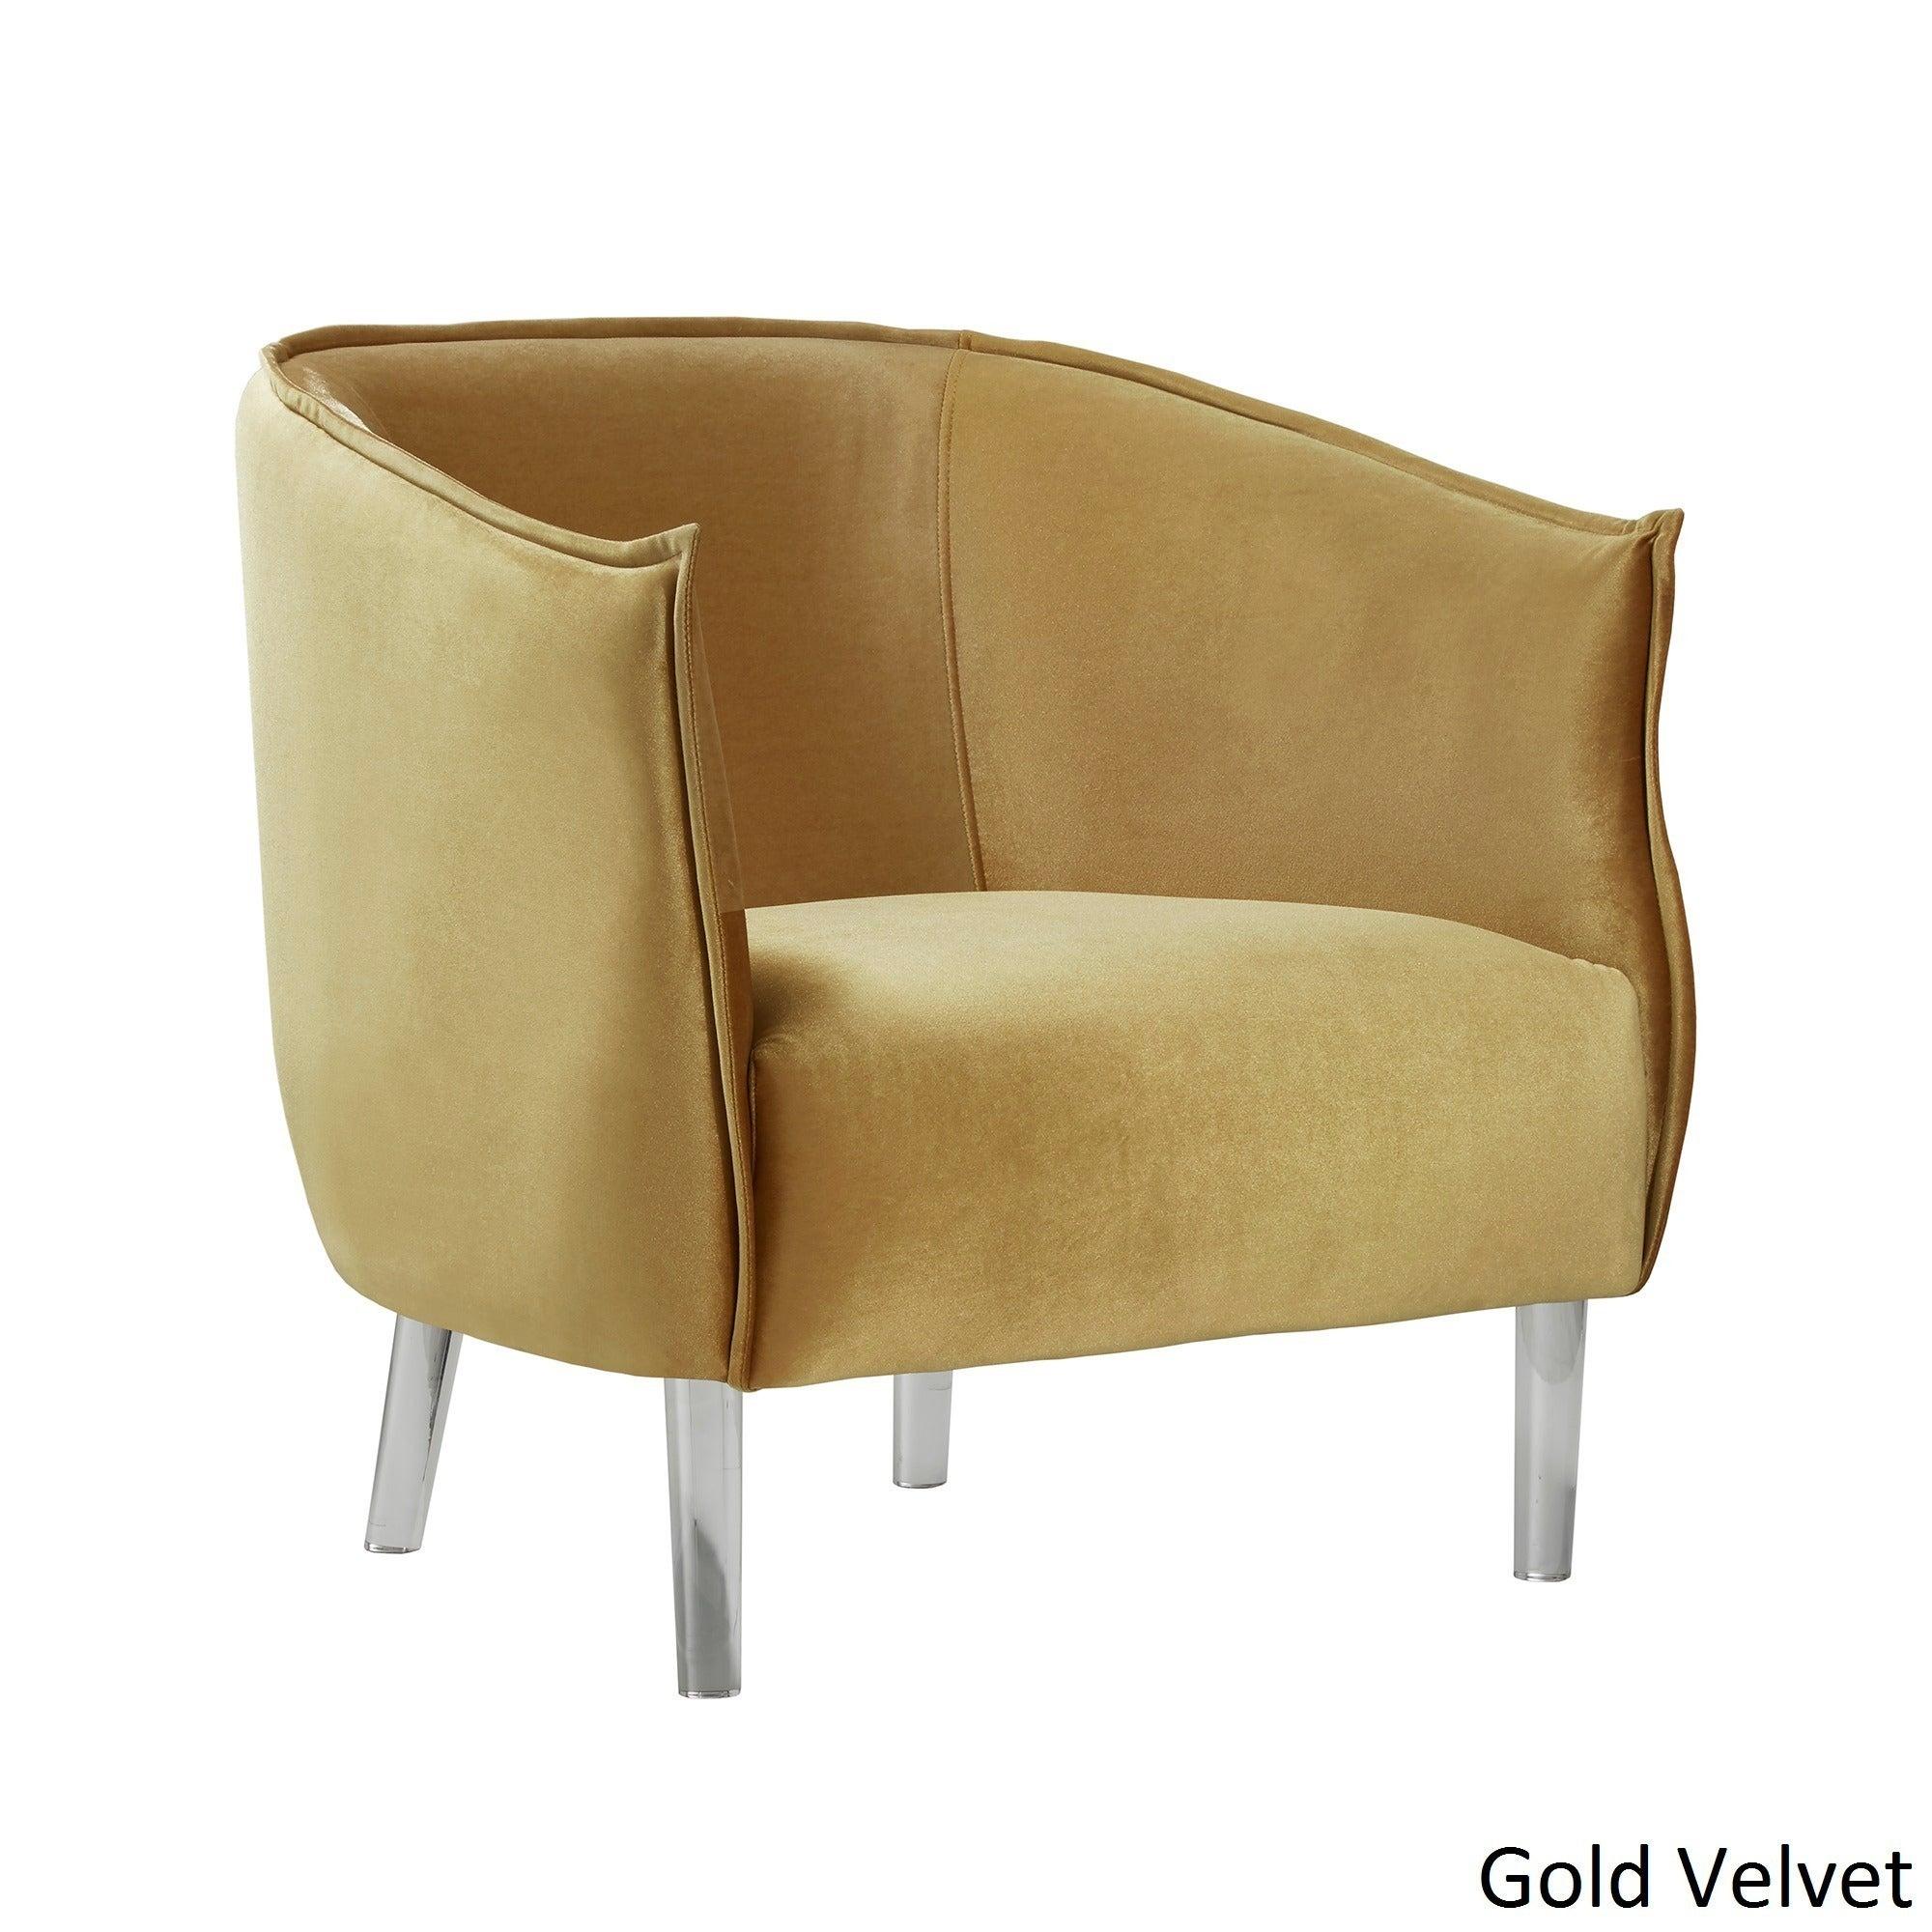 Vianne Velvet Curved Back Acrylic Leg Accent Chair